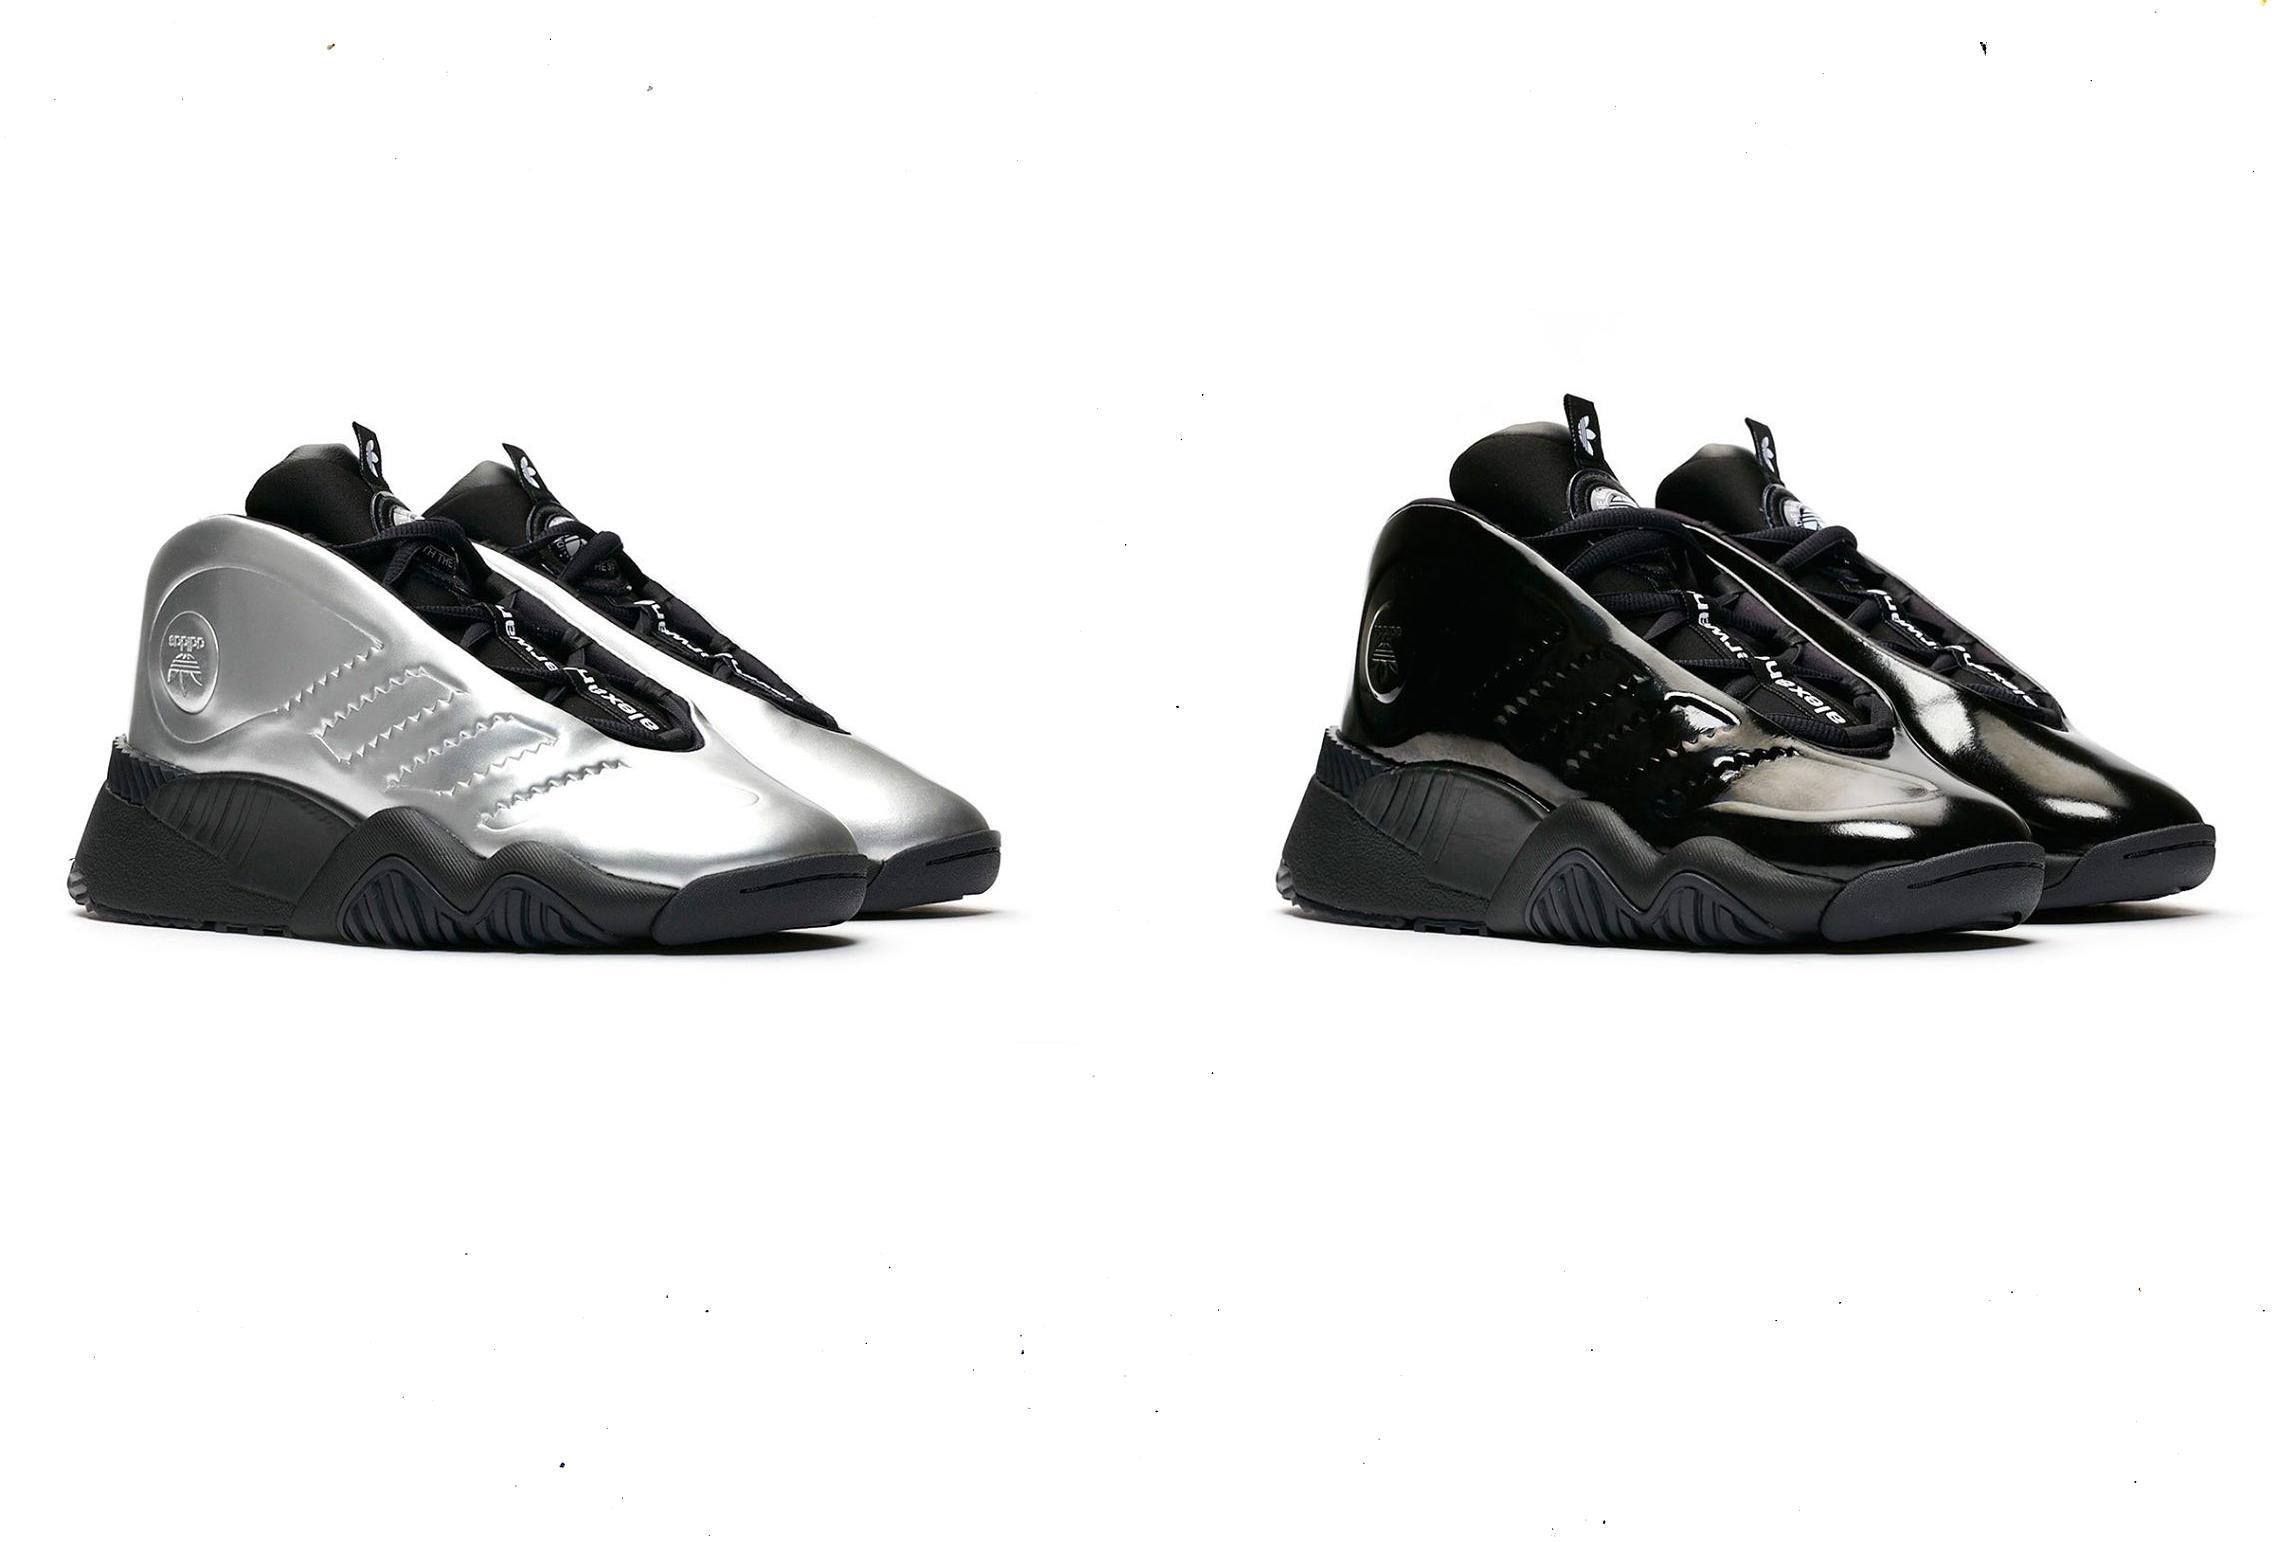 Alexander Wang x adidas最新合作!两色AW Futureshell极具未来感!